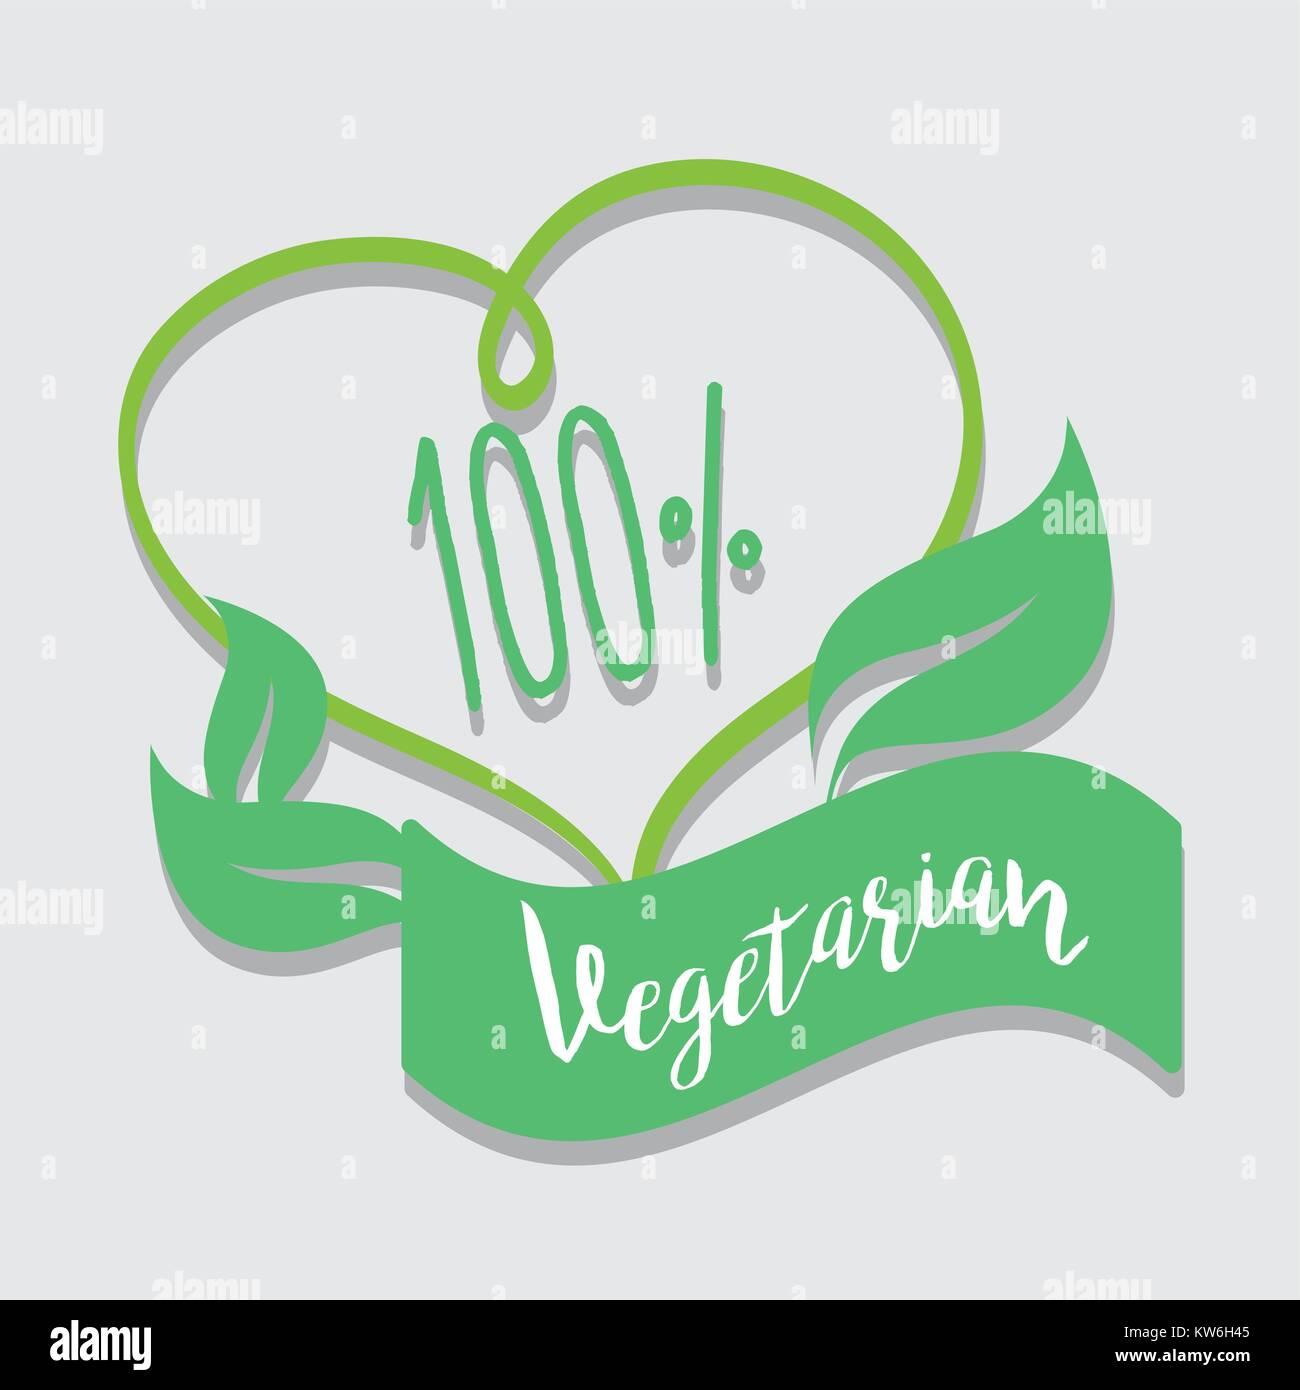 one hundred percent vegetarian food vector illustration - Stock Vector